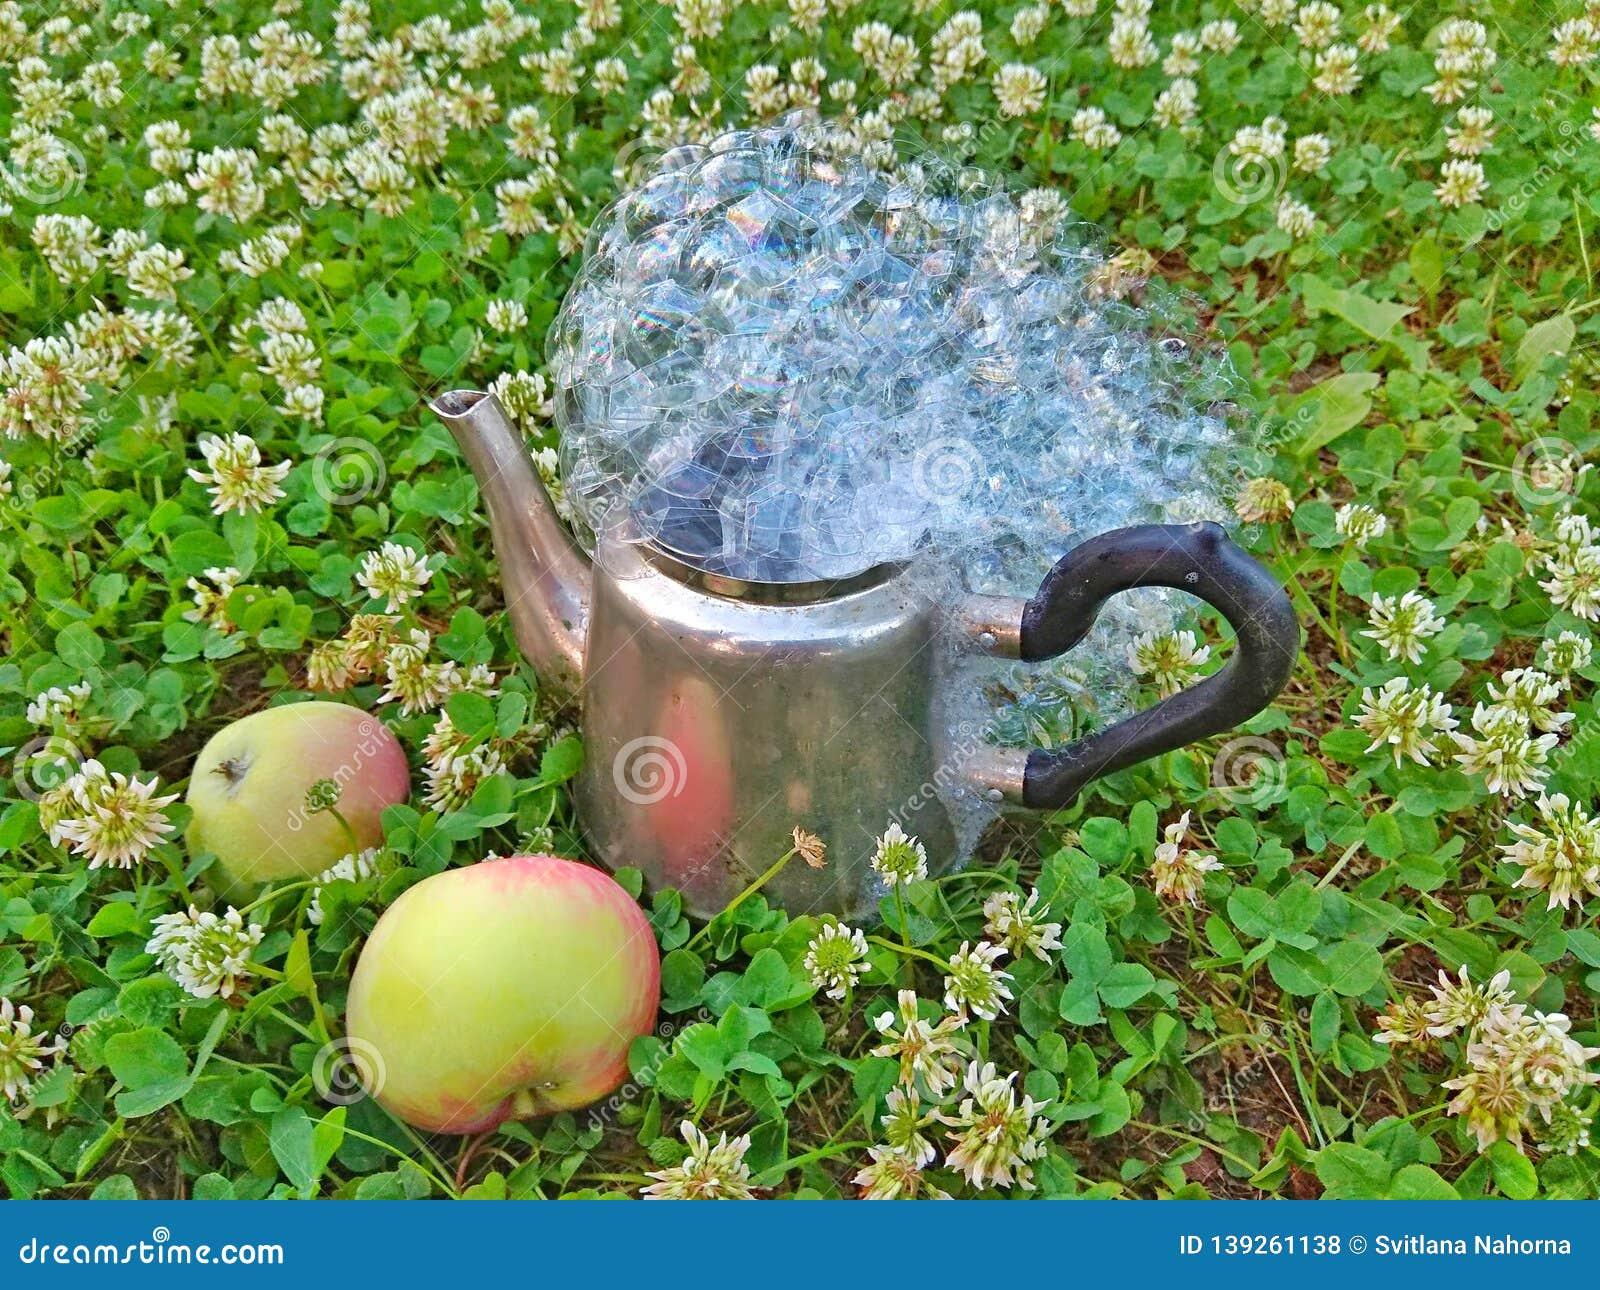 Metal coffee pot on grass